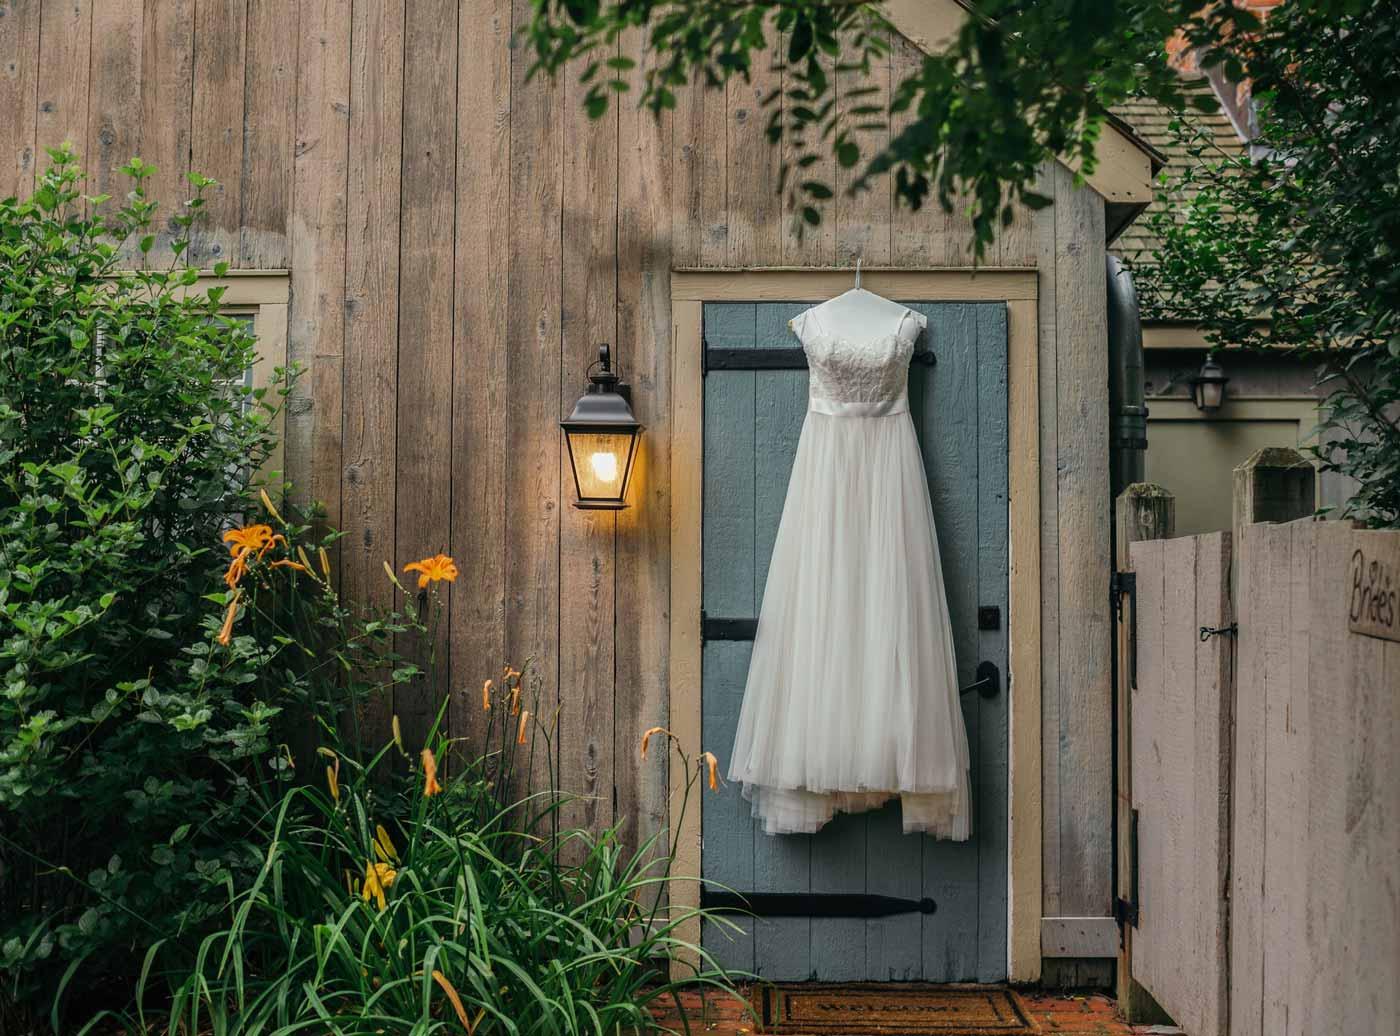 A wedding dress hanging on a rustic cabin door.